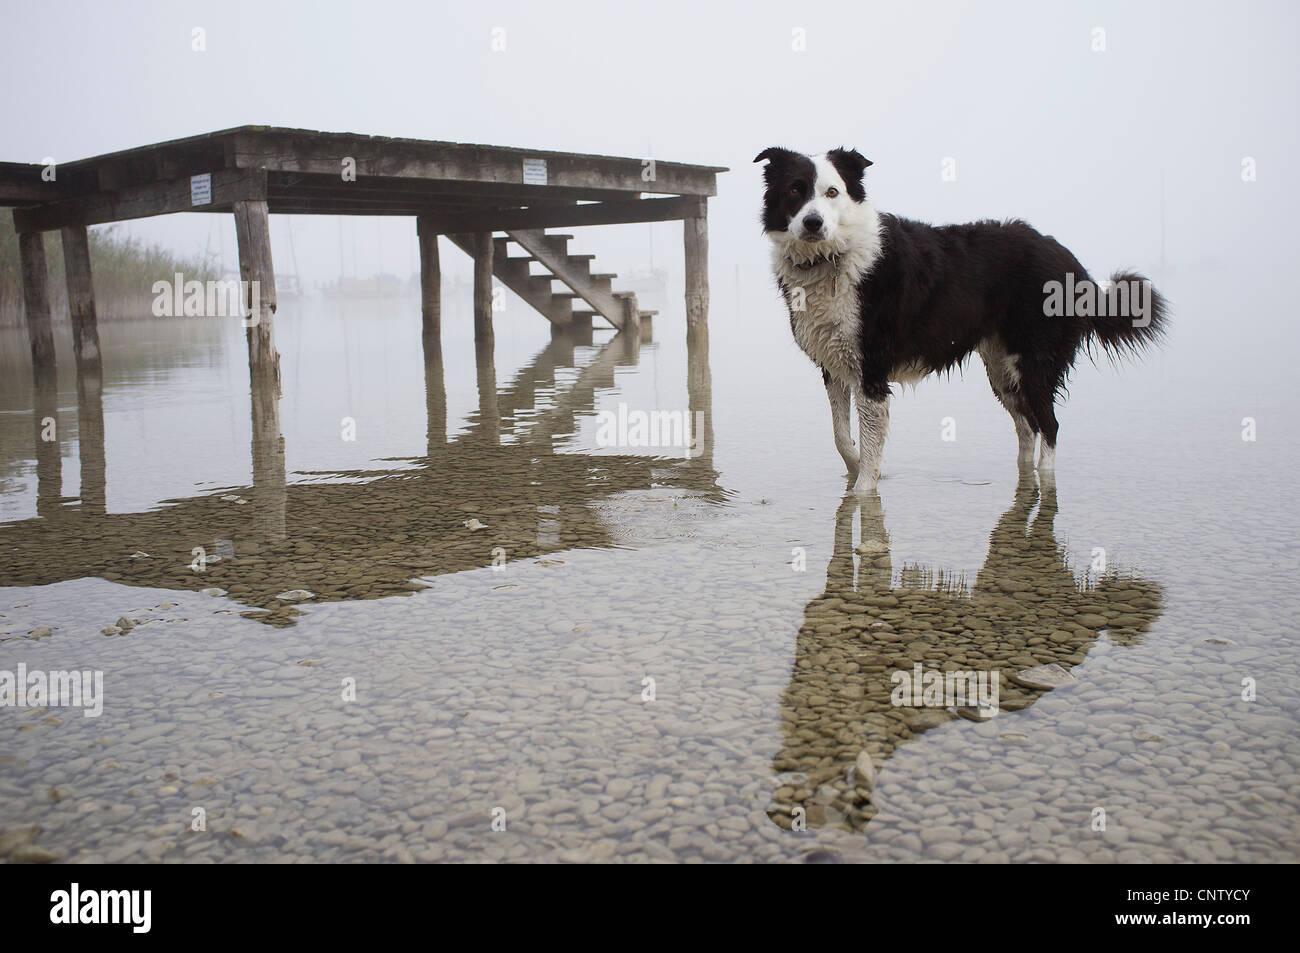 Hund noch See waten Stockbild